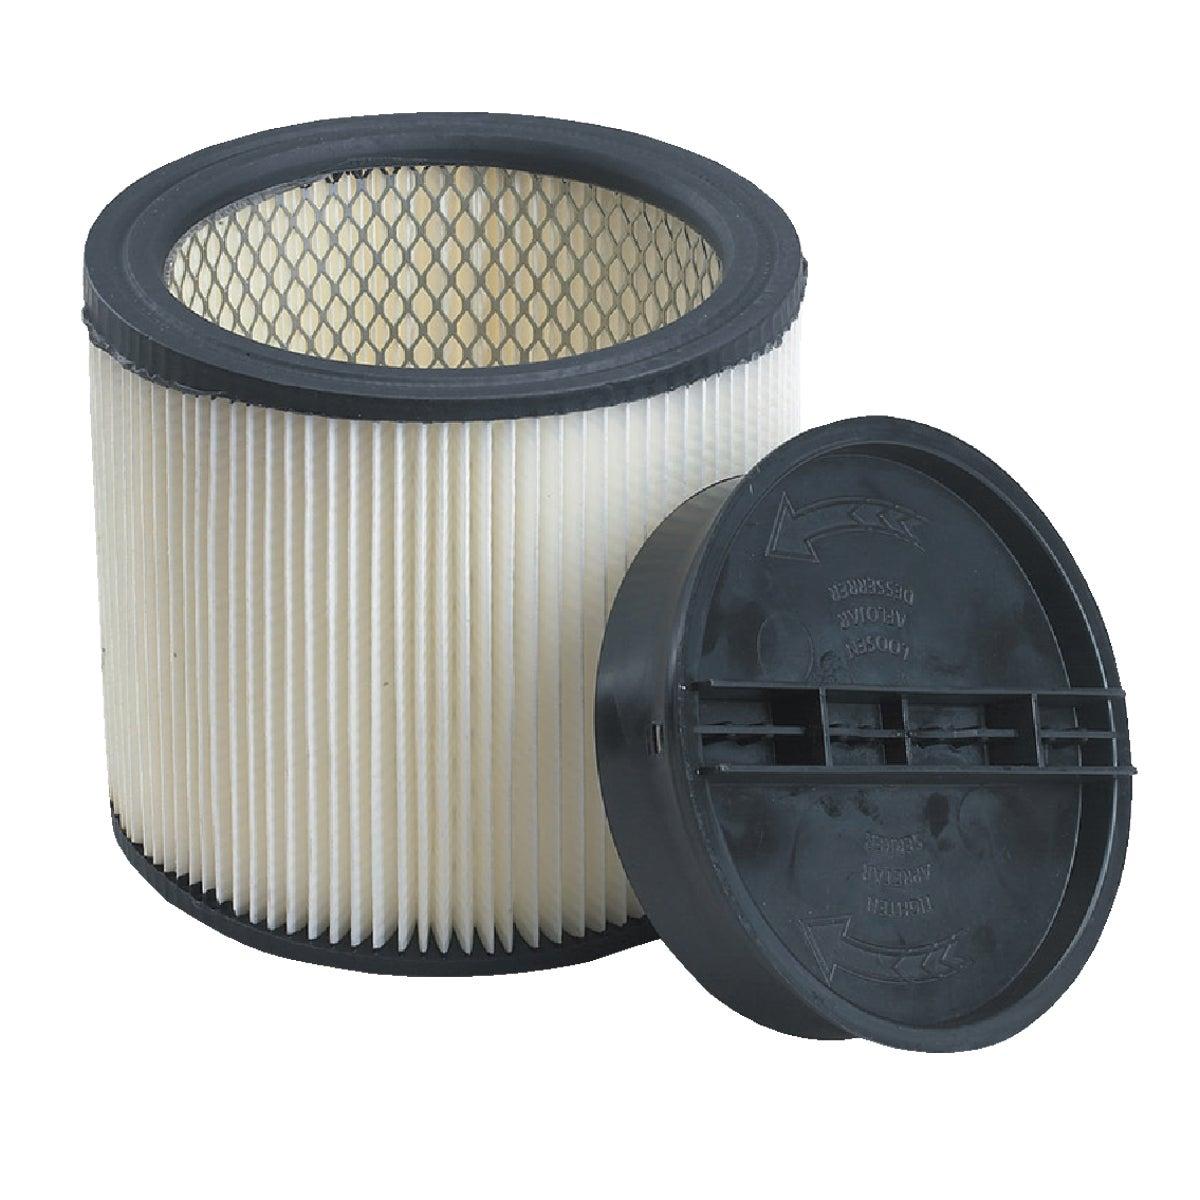 Wet/Dry Cartridge Filter